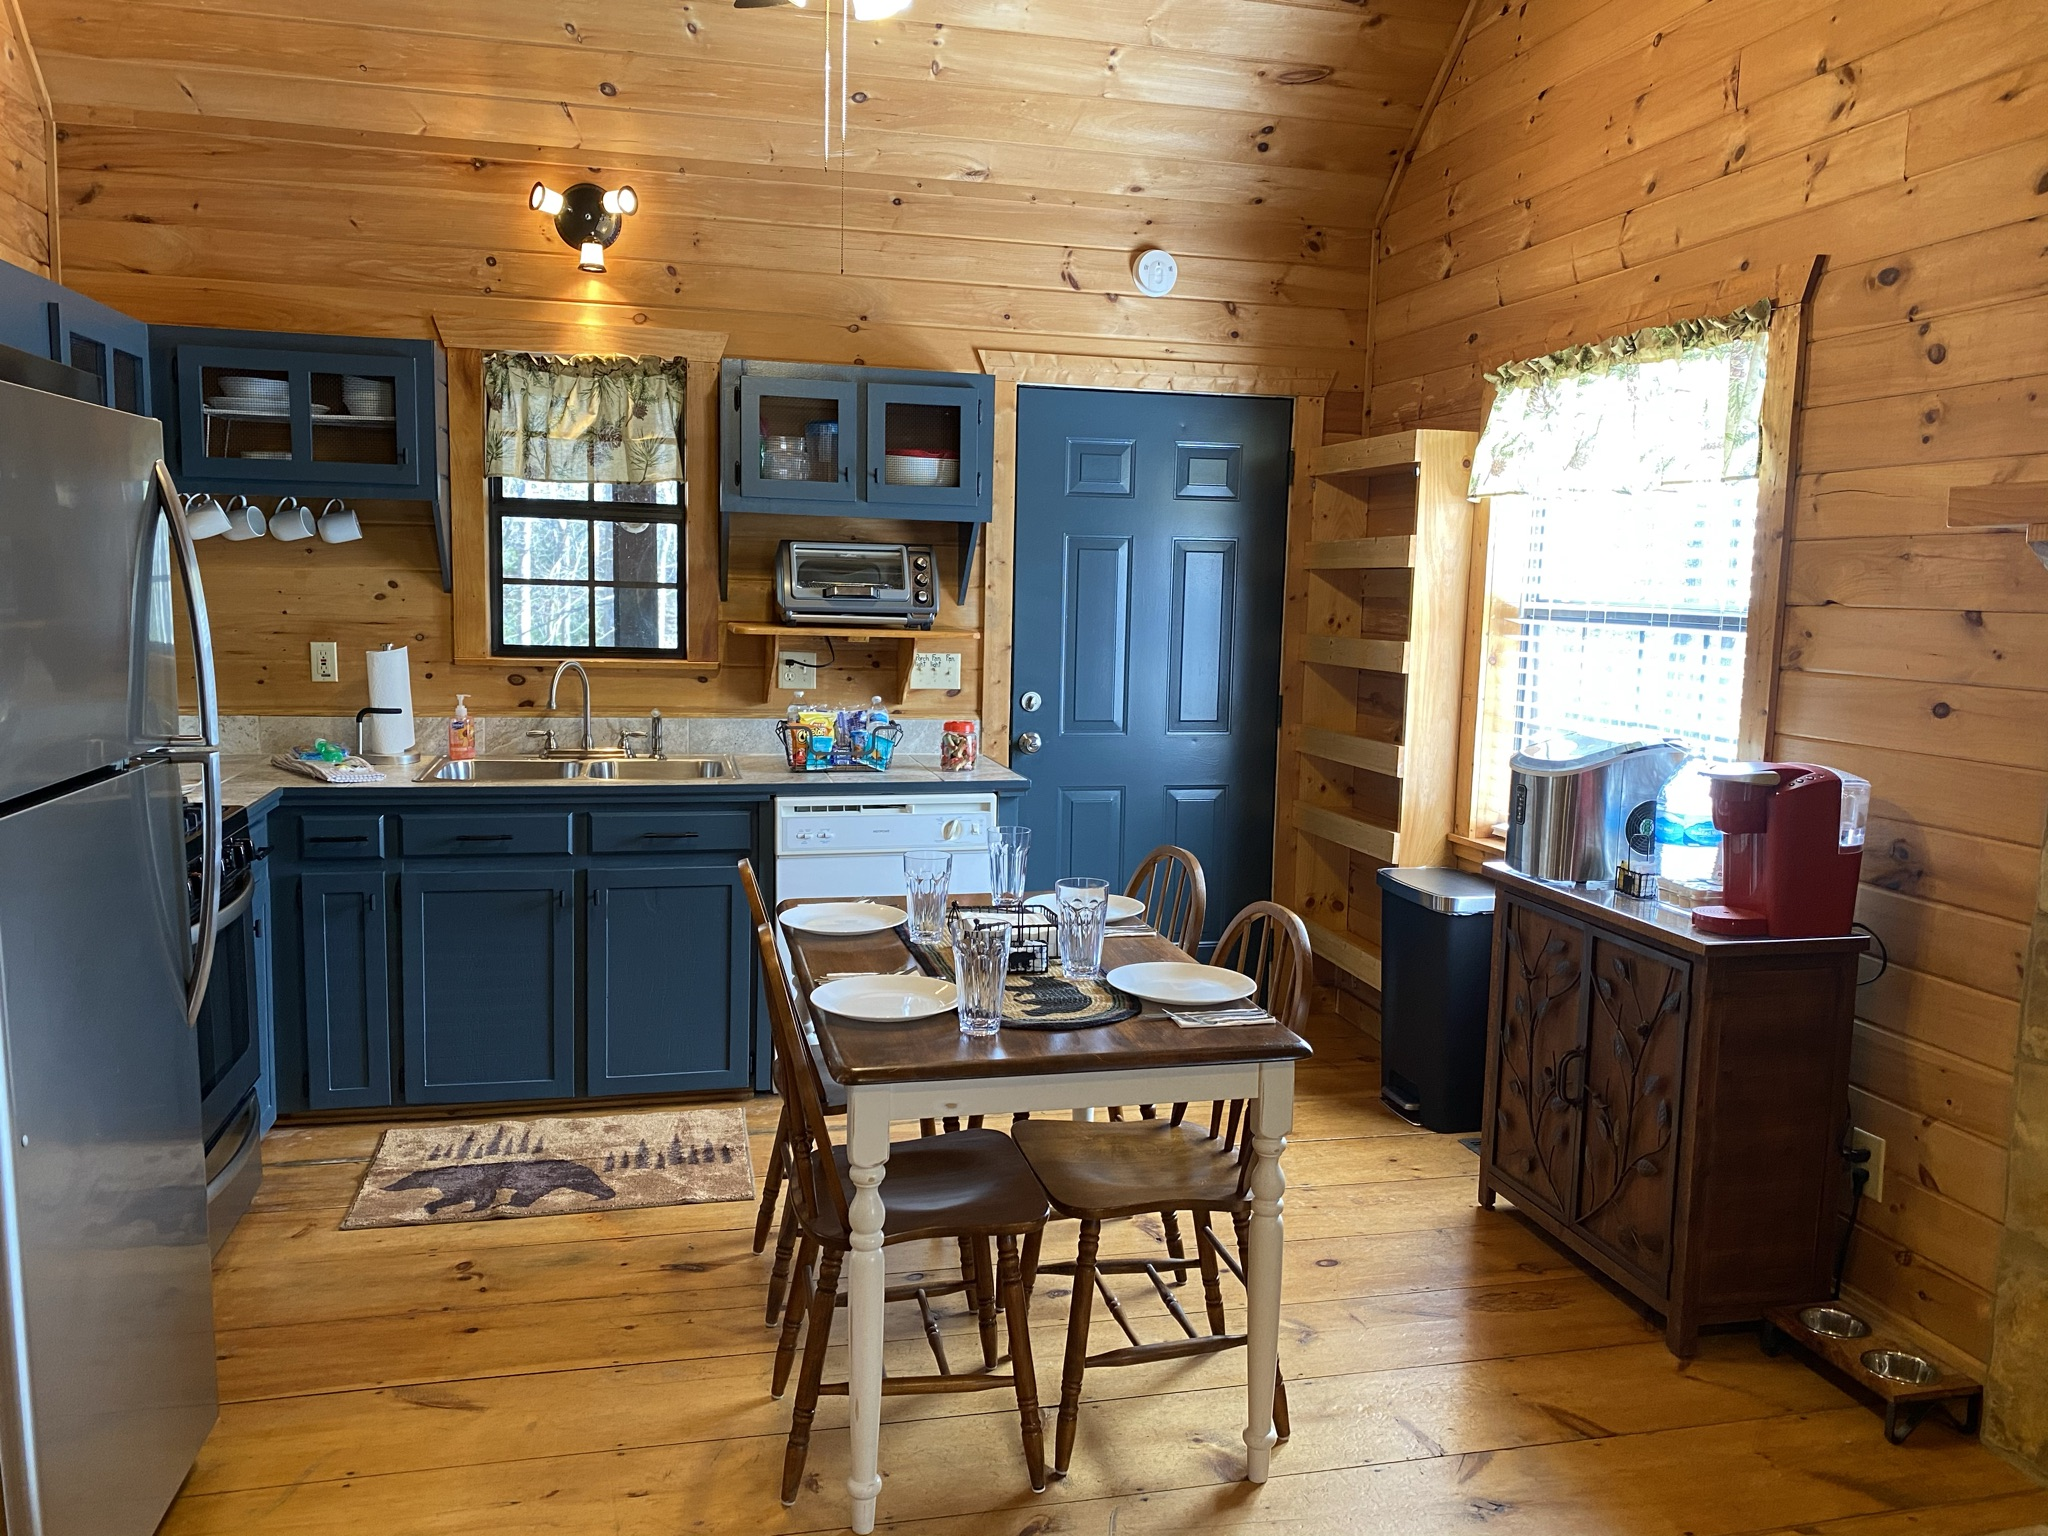 Kitchen includes Keurig, blender, crockpot, toaster oven, iced tea maker, electric kettle, drip coffee maker